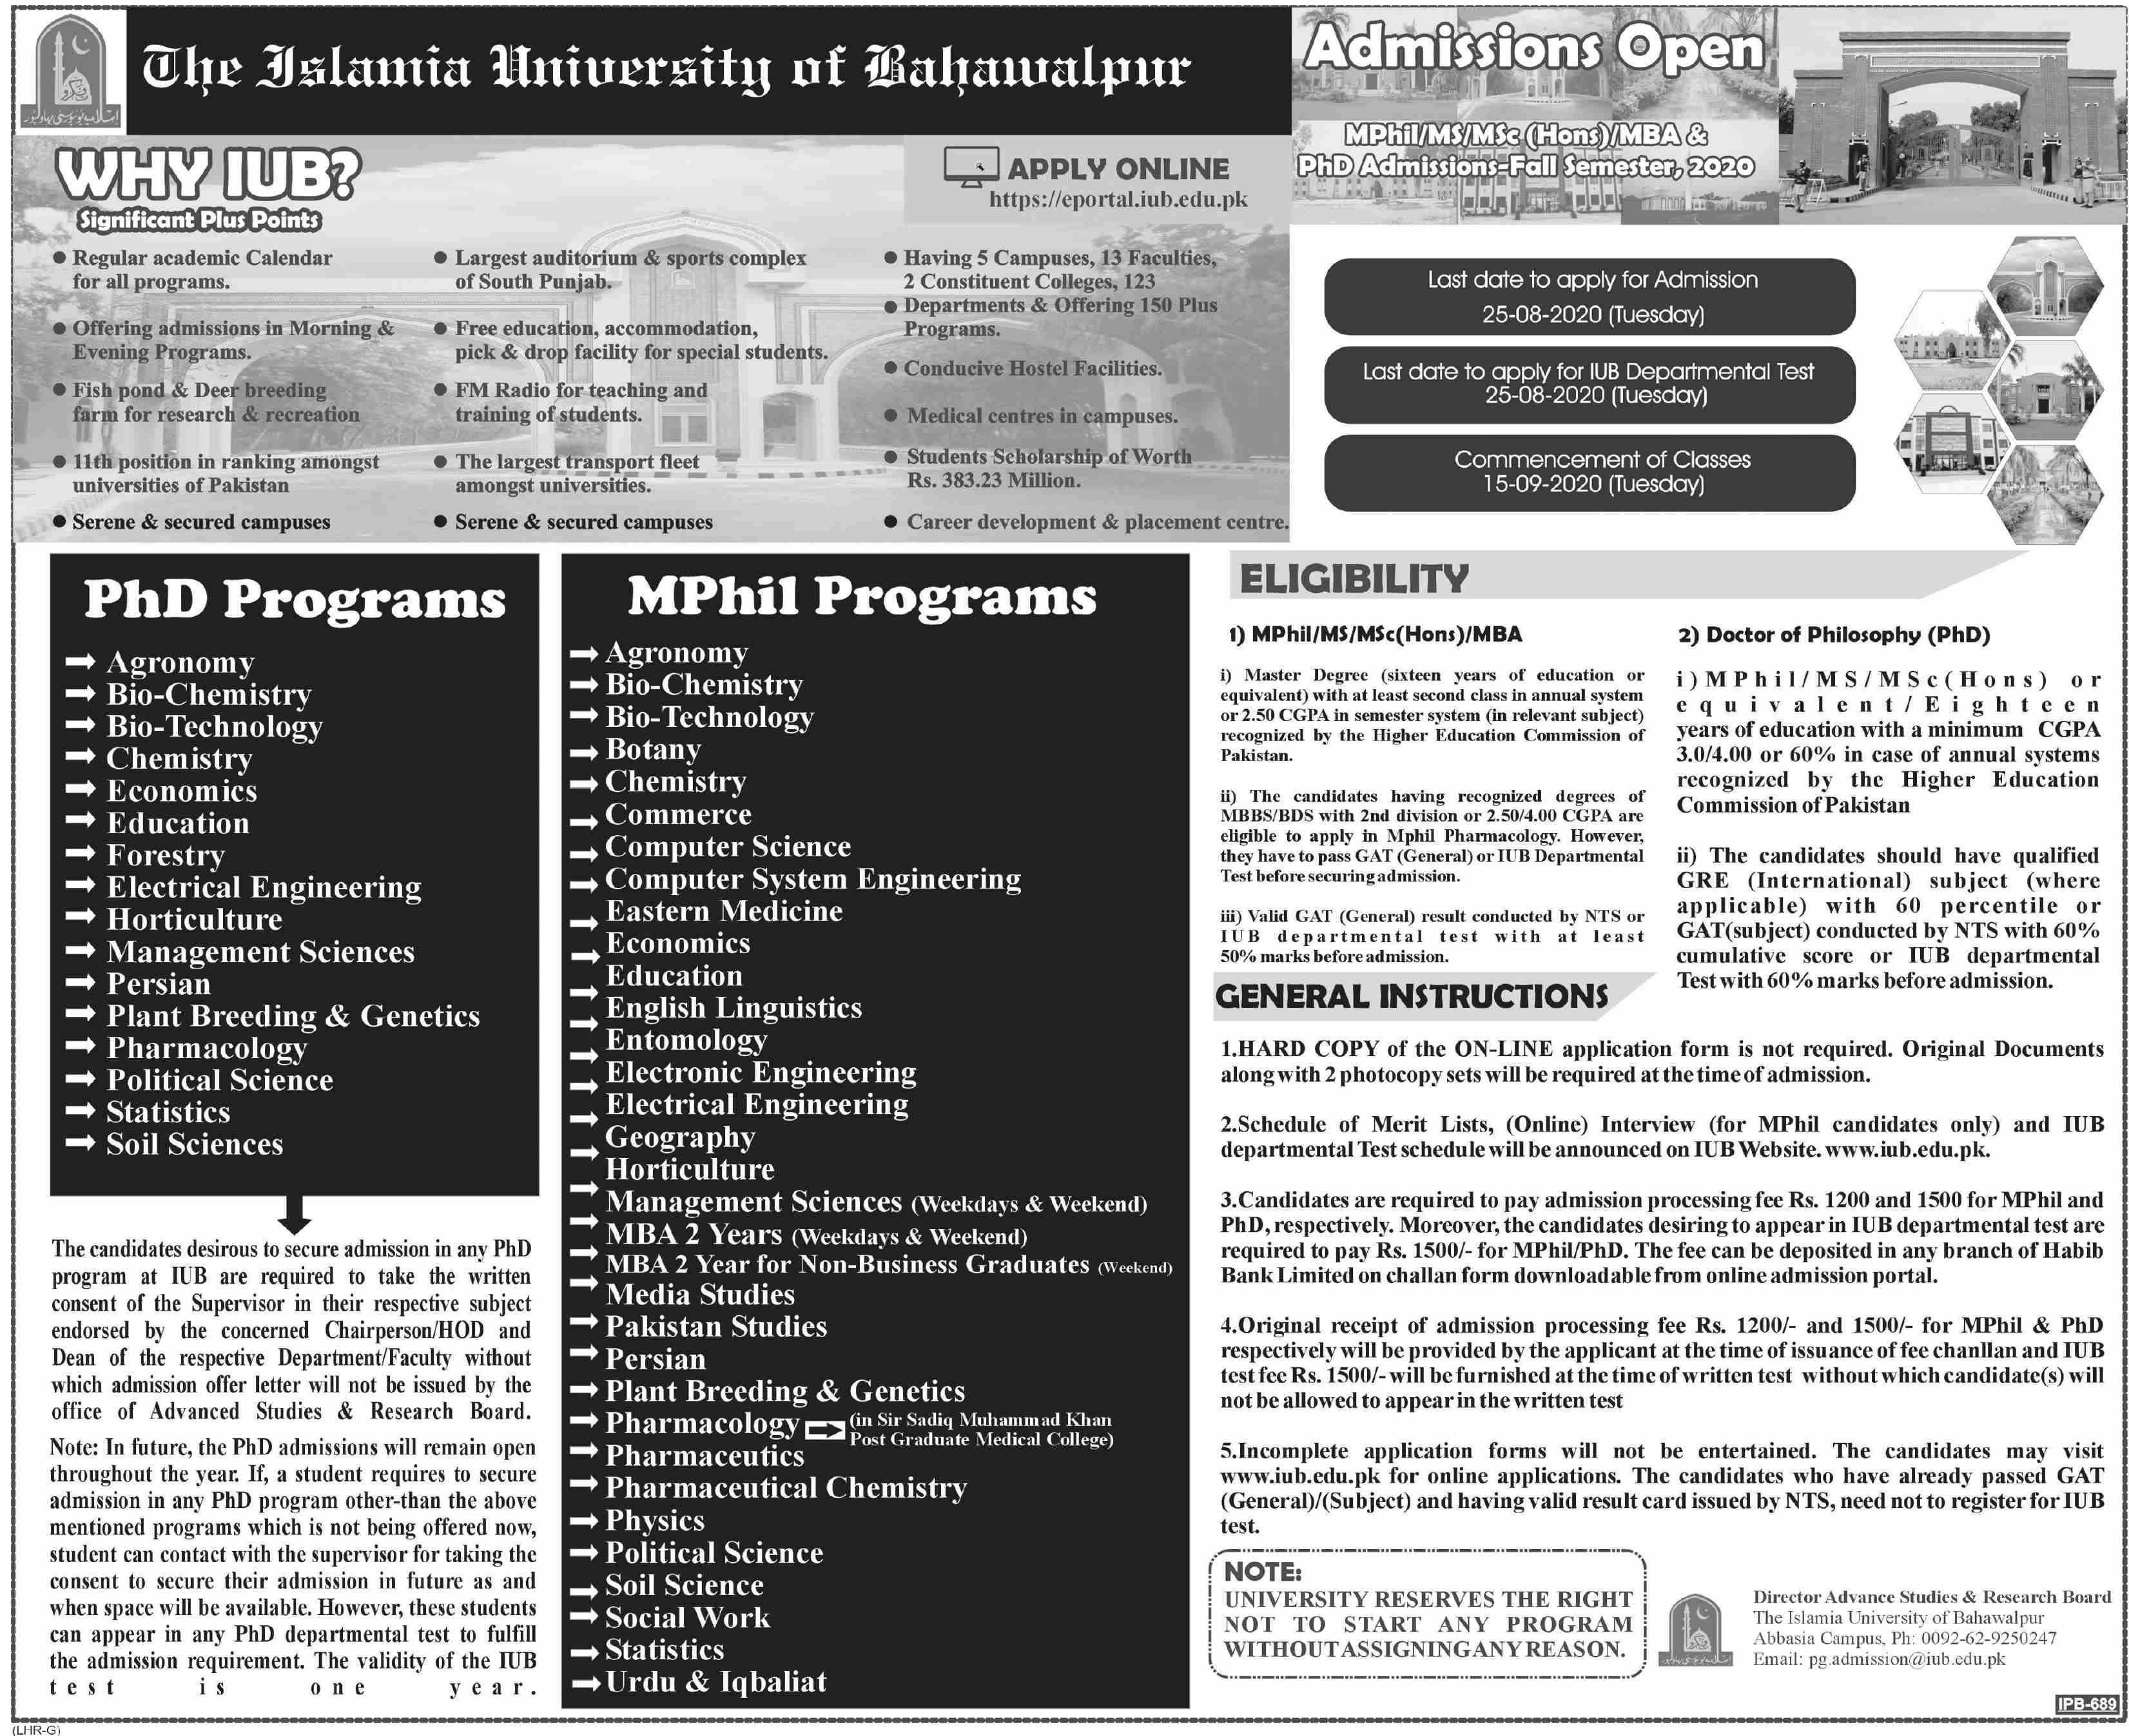 The Islamia University Of Bahawalpur Admissions